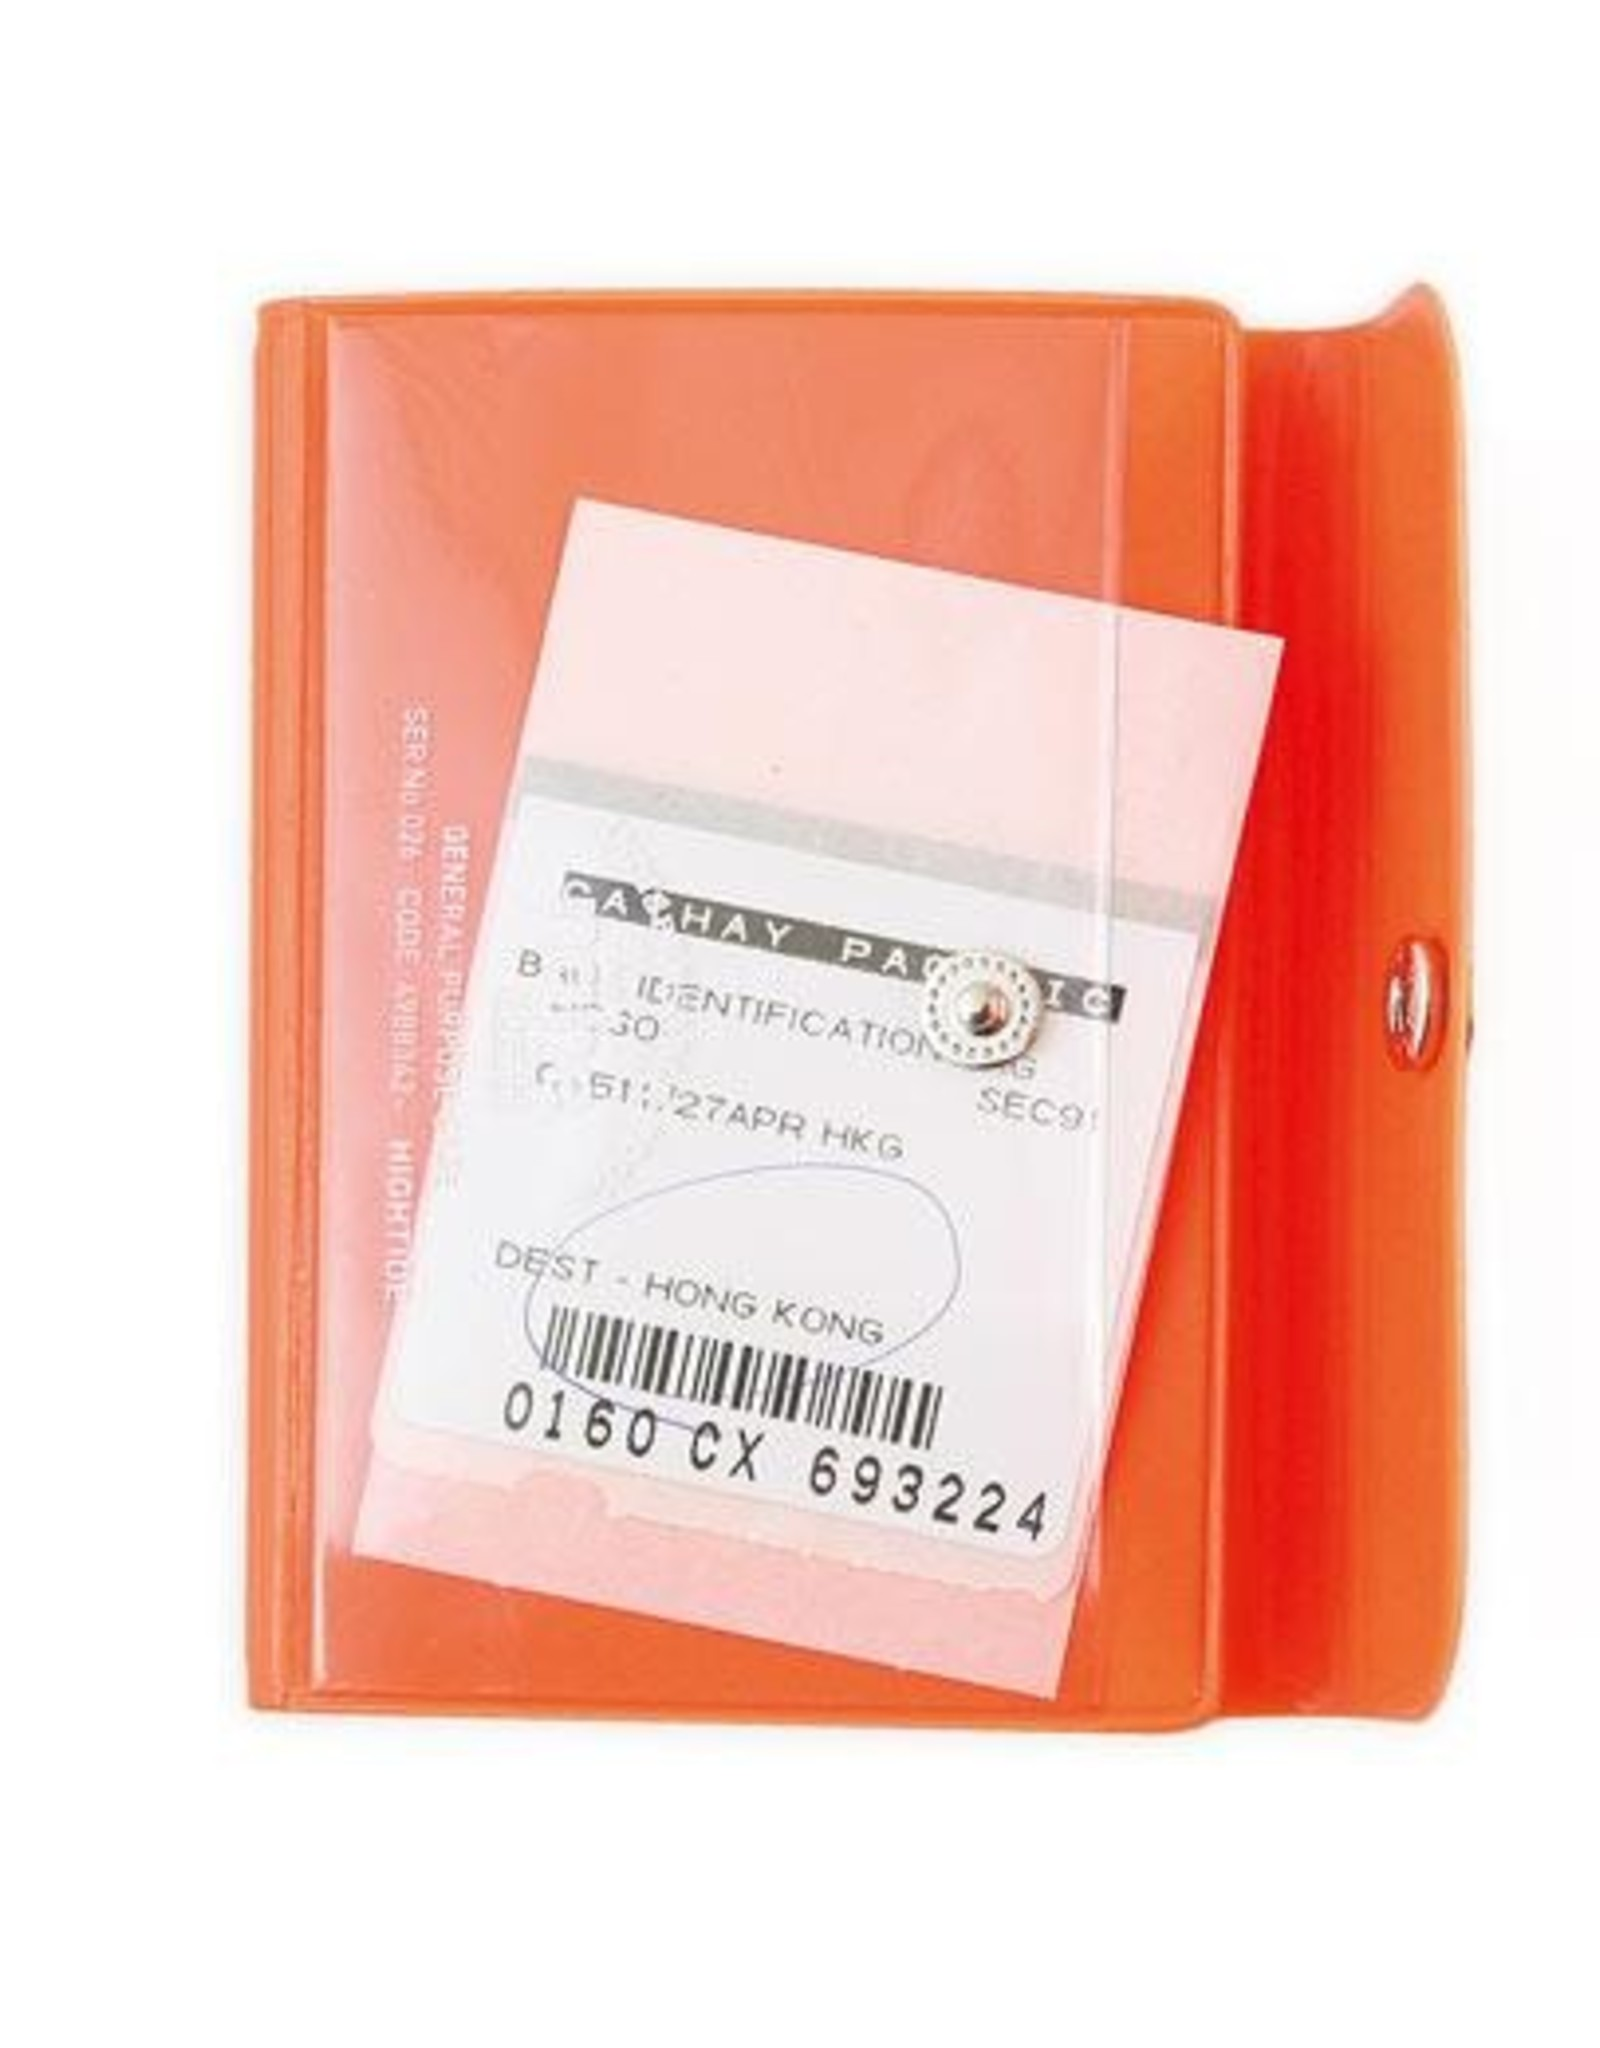 Hightide Hightide Card Case